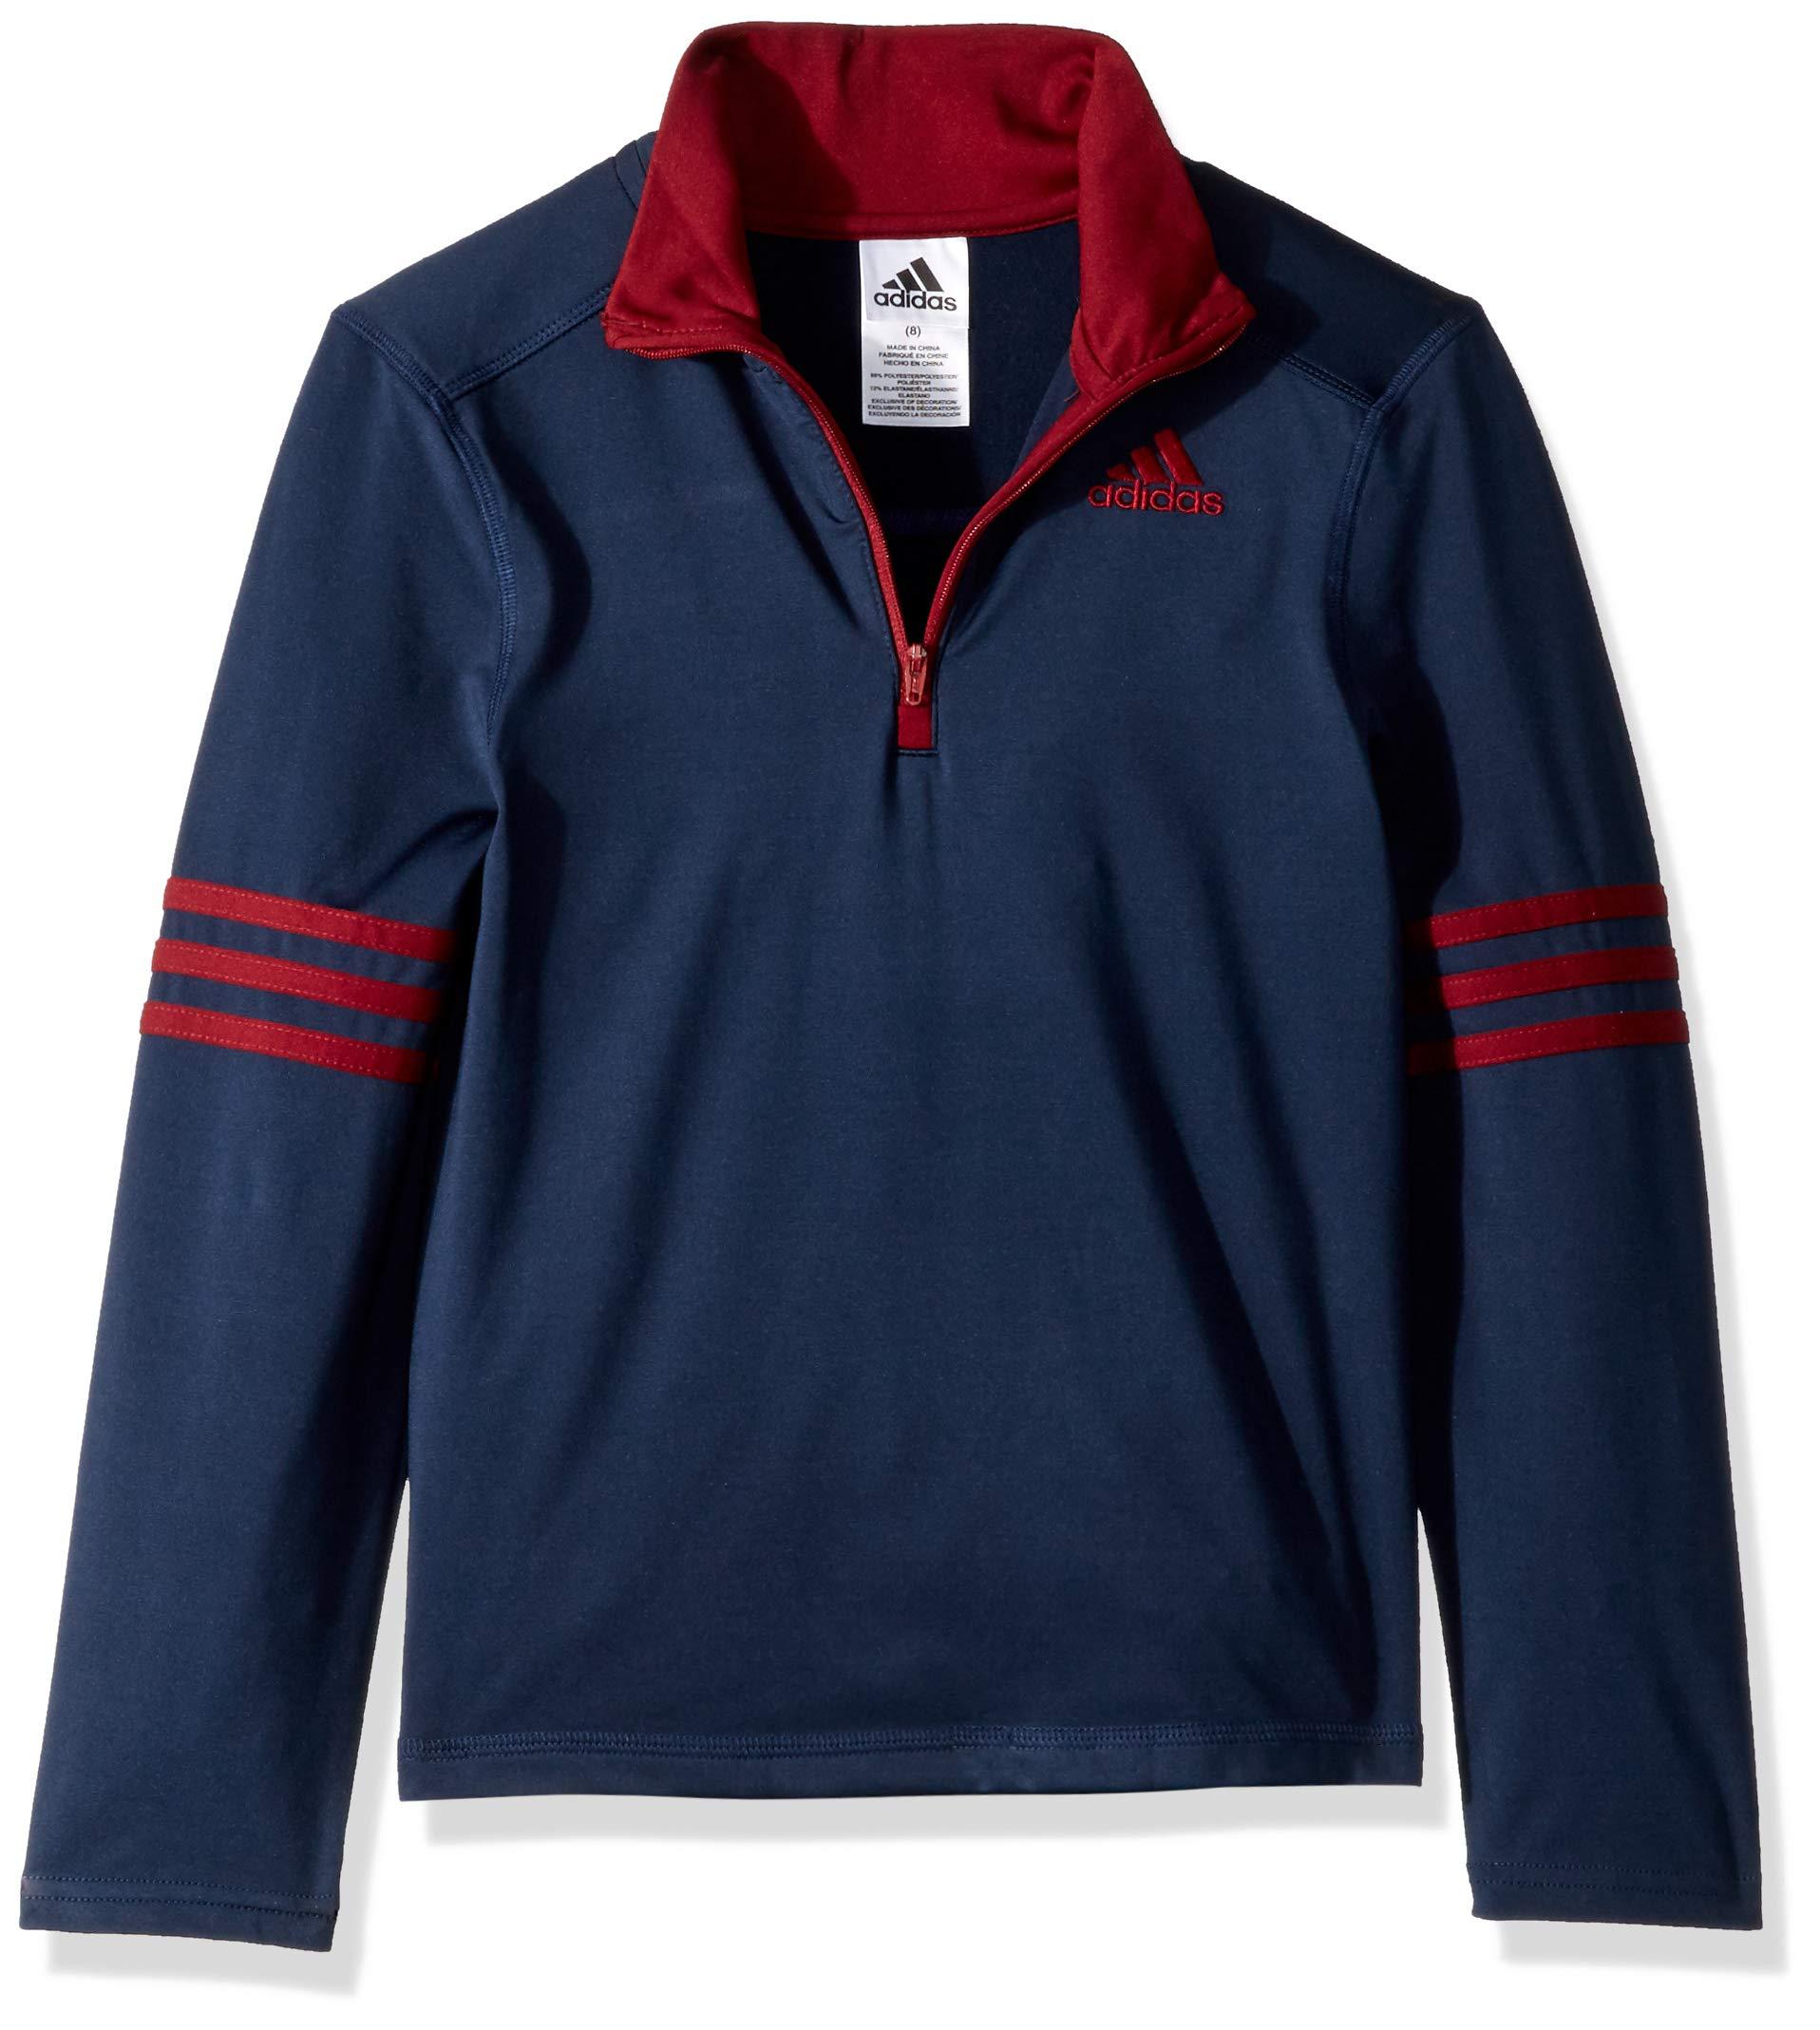 adidas Boys' Big Athletic Quarterzip, Navy, S (8/10)